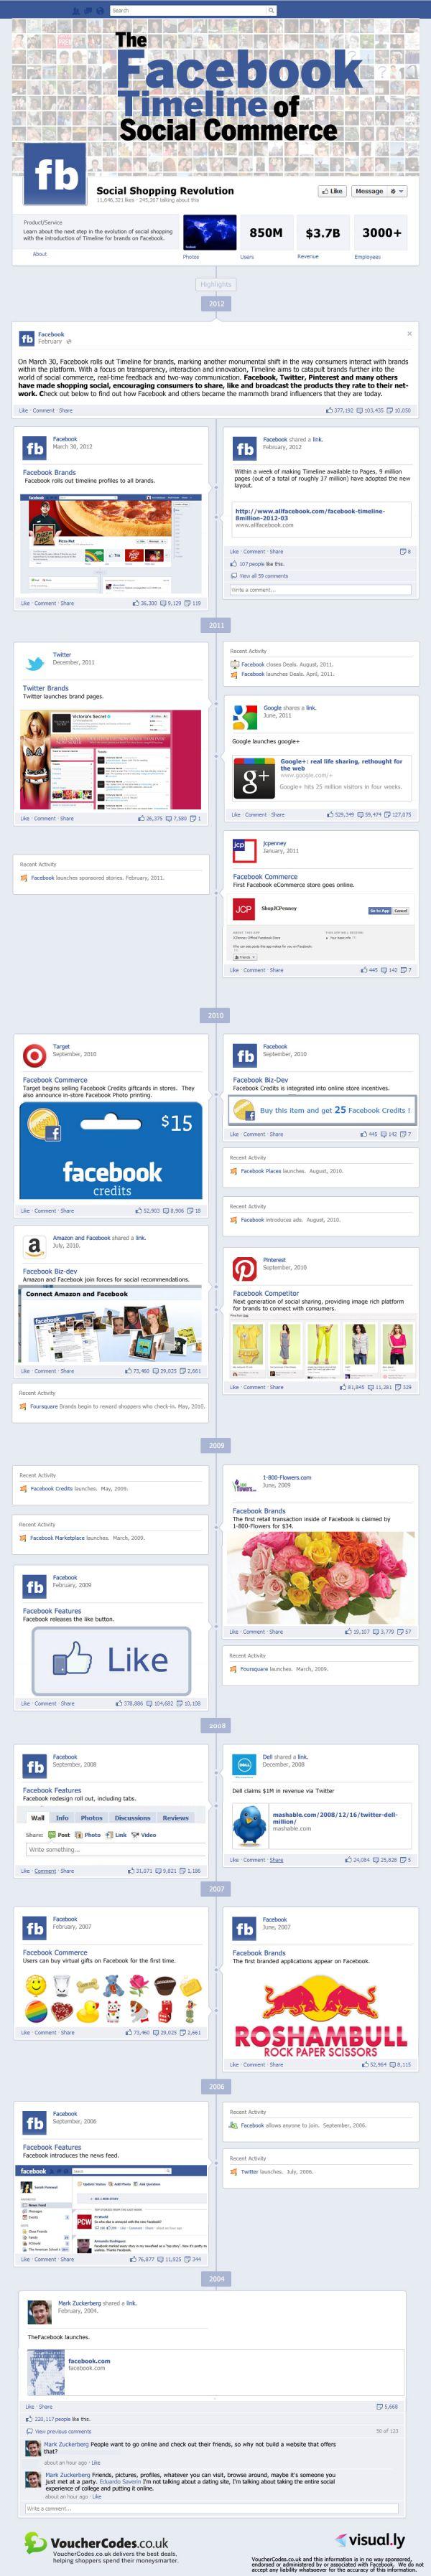 The Facebook Timeline of Social Commerce